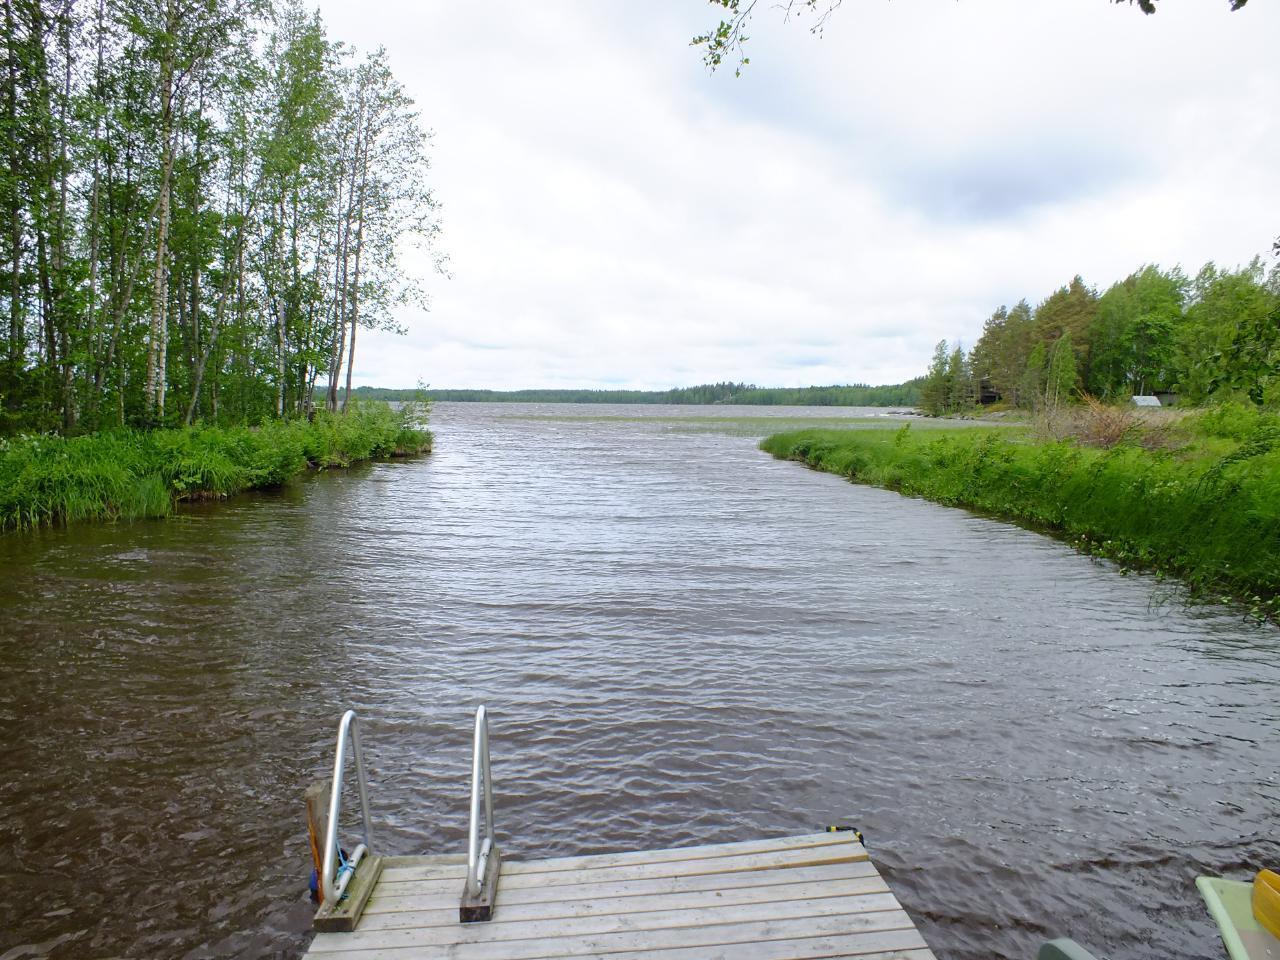 Ferienhaus - Mökki mit Sauna direkt am See  in Mouhijärvi-Sastamala (1707905), Mouhijärvi, , Westfinnland, Finnland, Bild 13